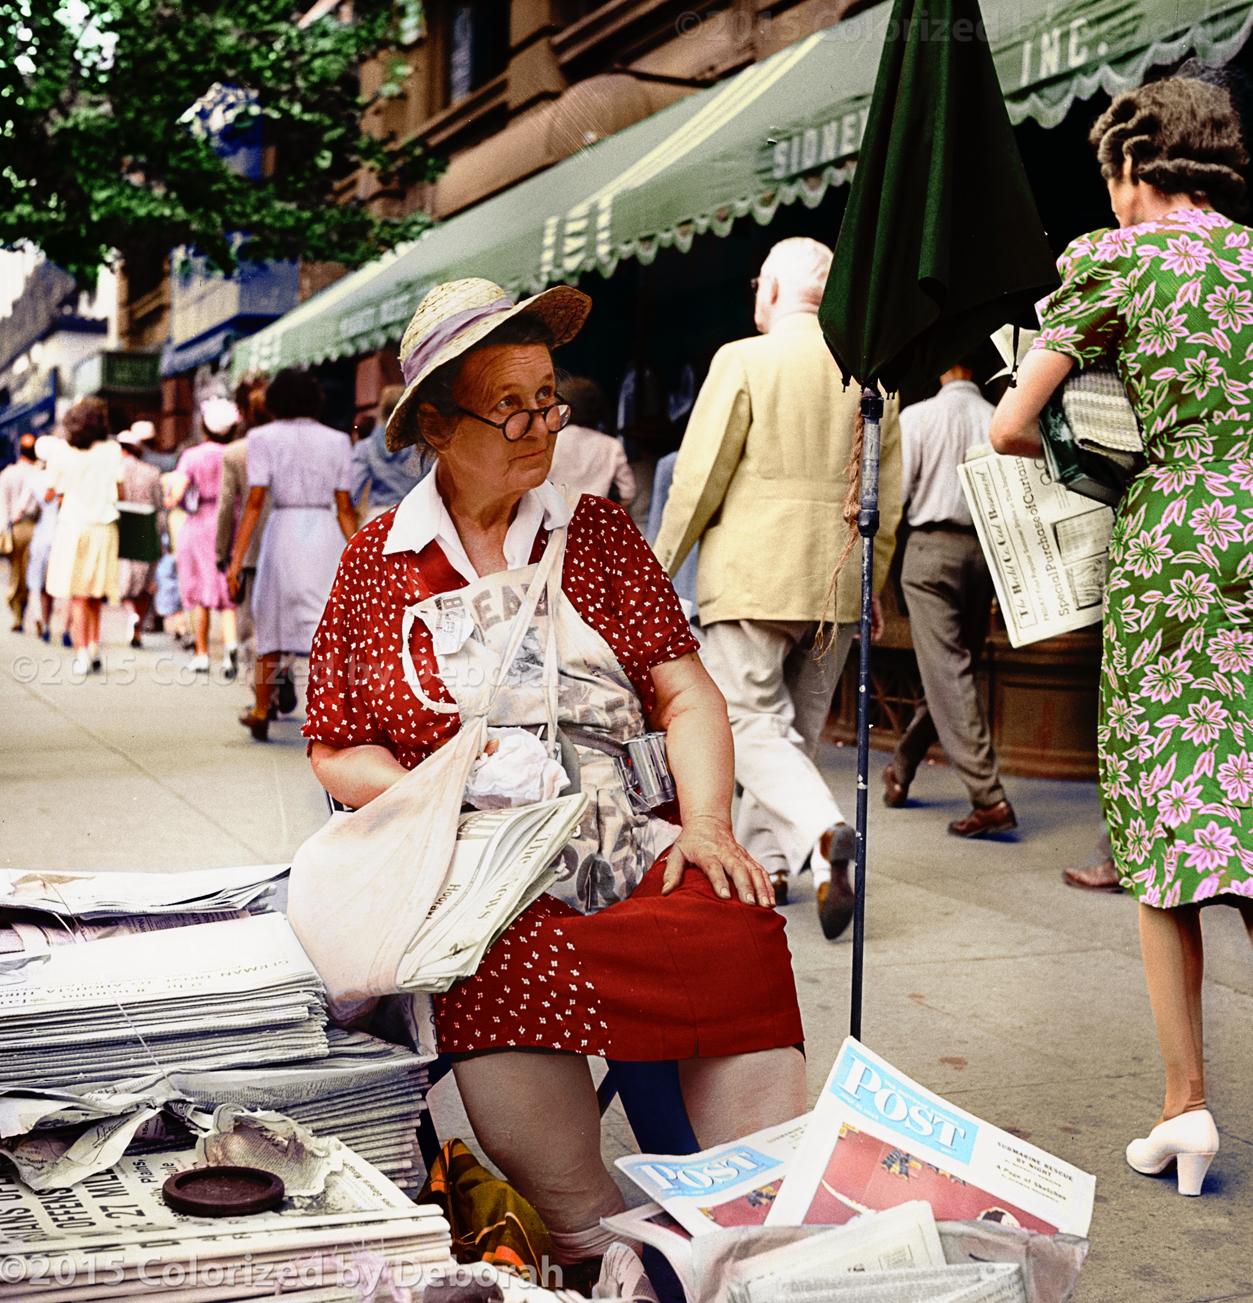 Washington, D.C. A woman newspaper vendor, July 1943